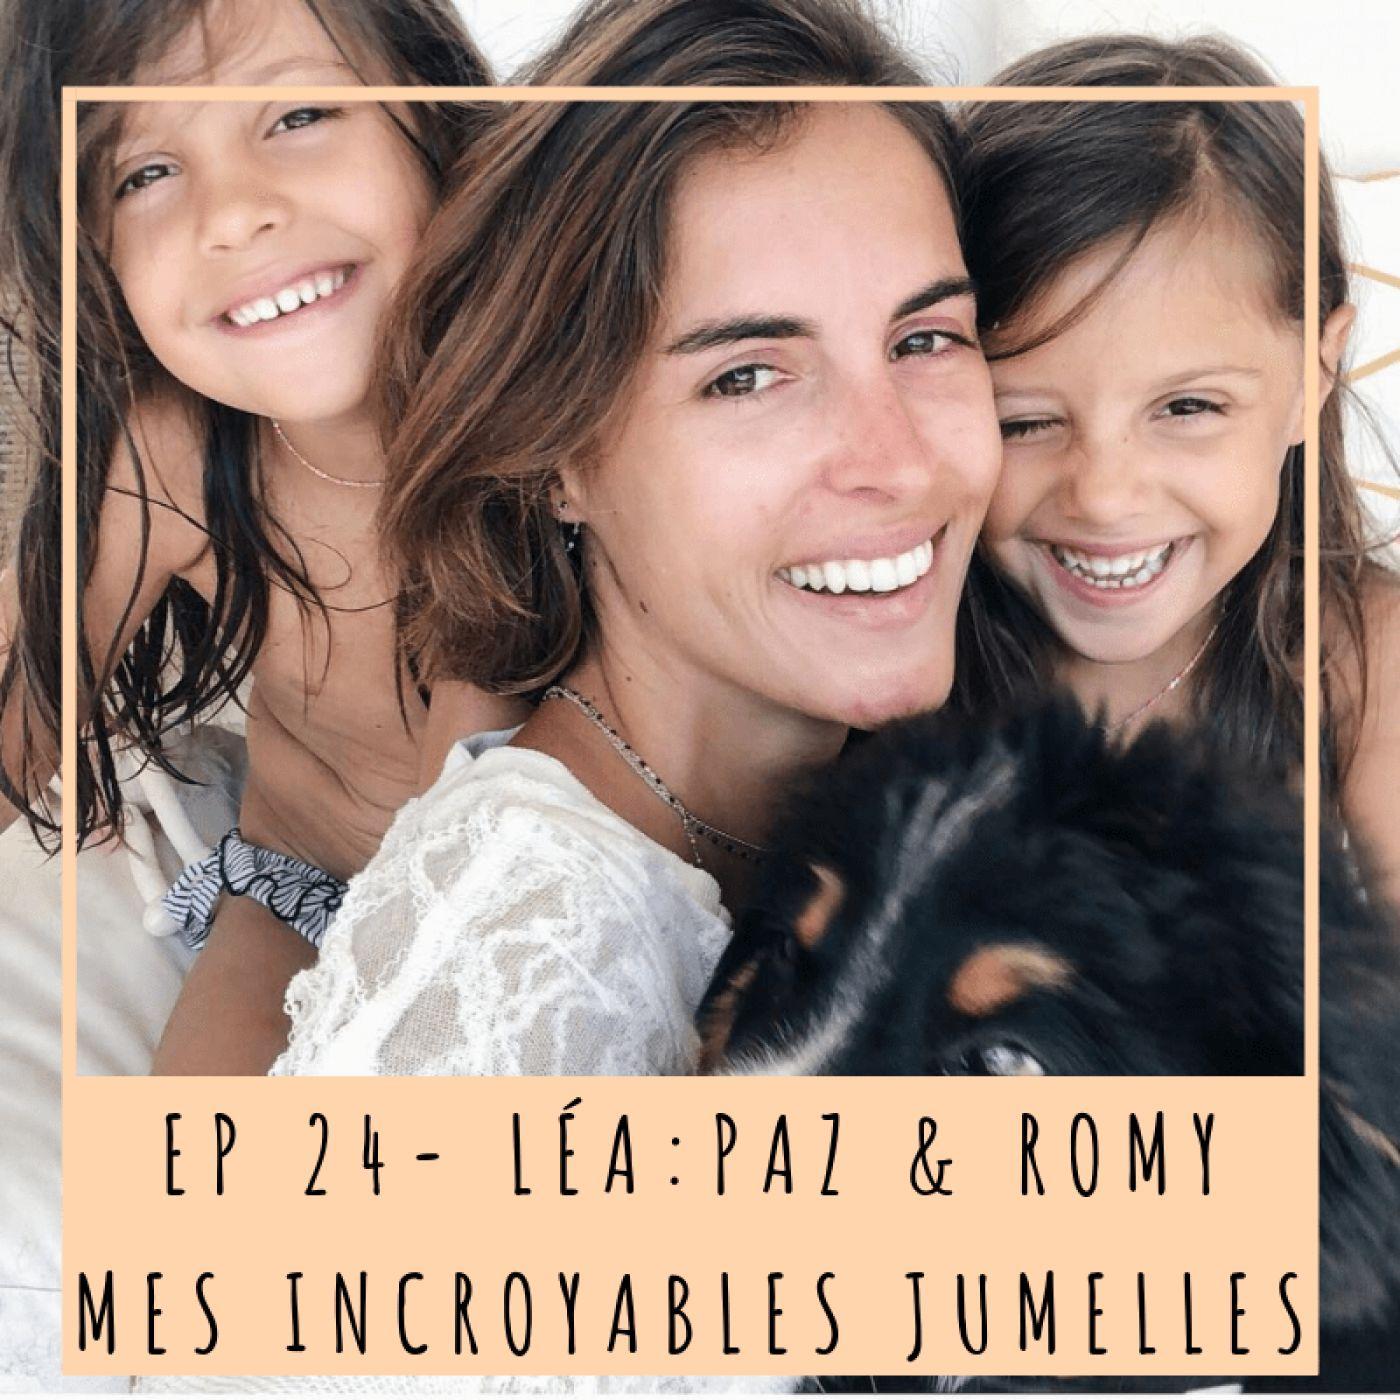 EP24 - LEA: PAZ & ROMY, MES INCROYABLES JUMELLES